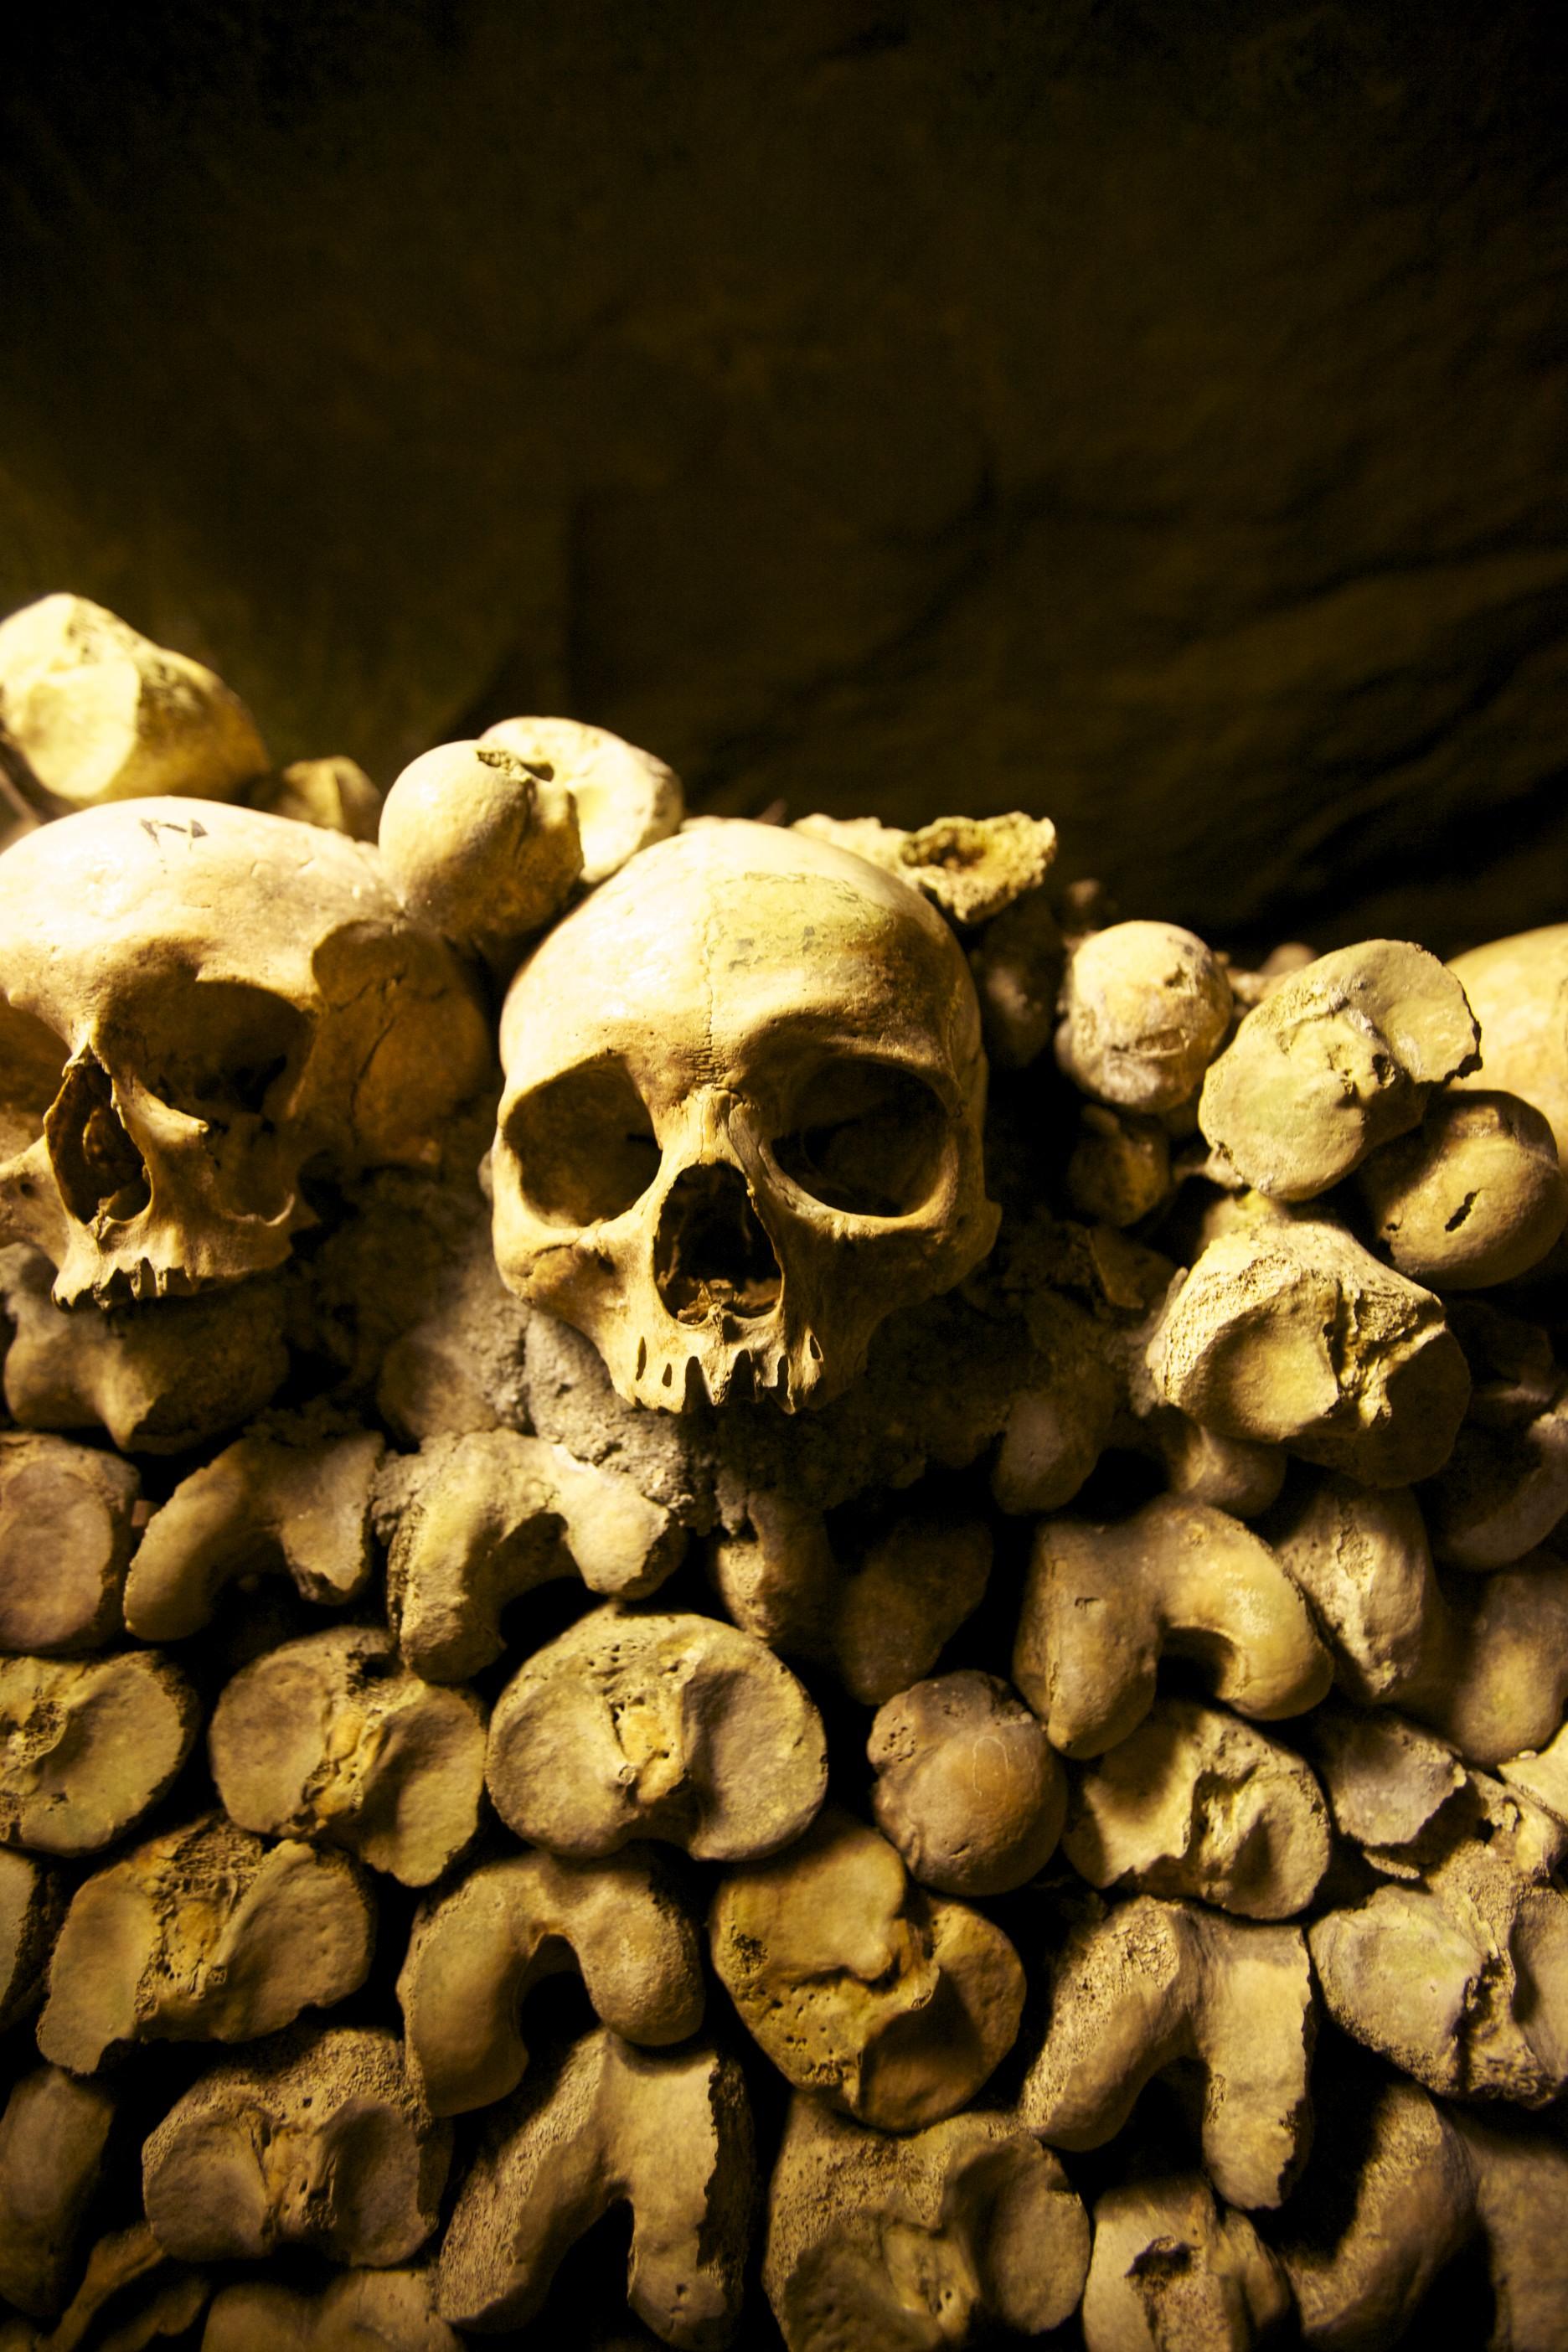 Skulls and bones in the catacombs.